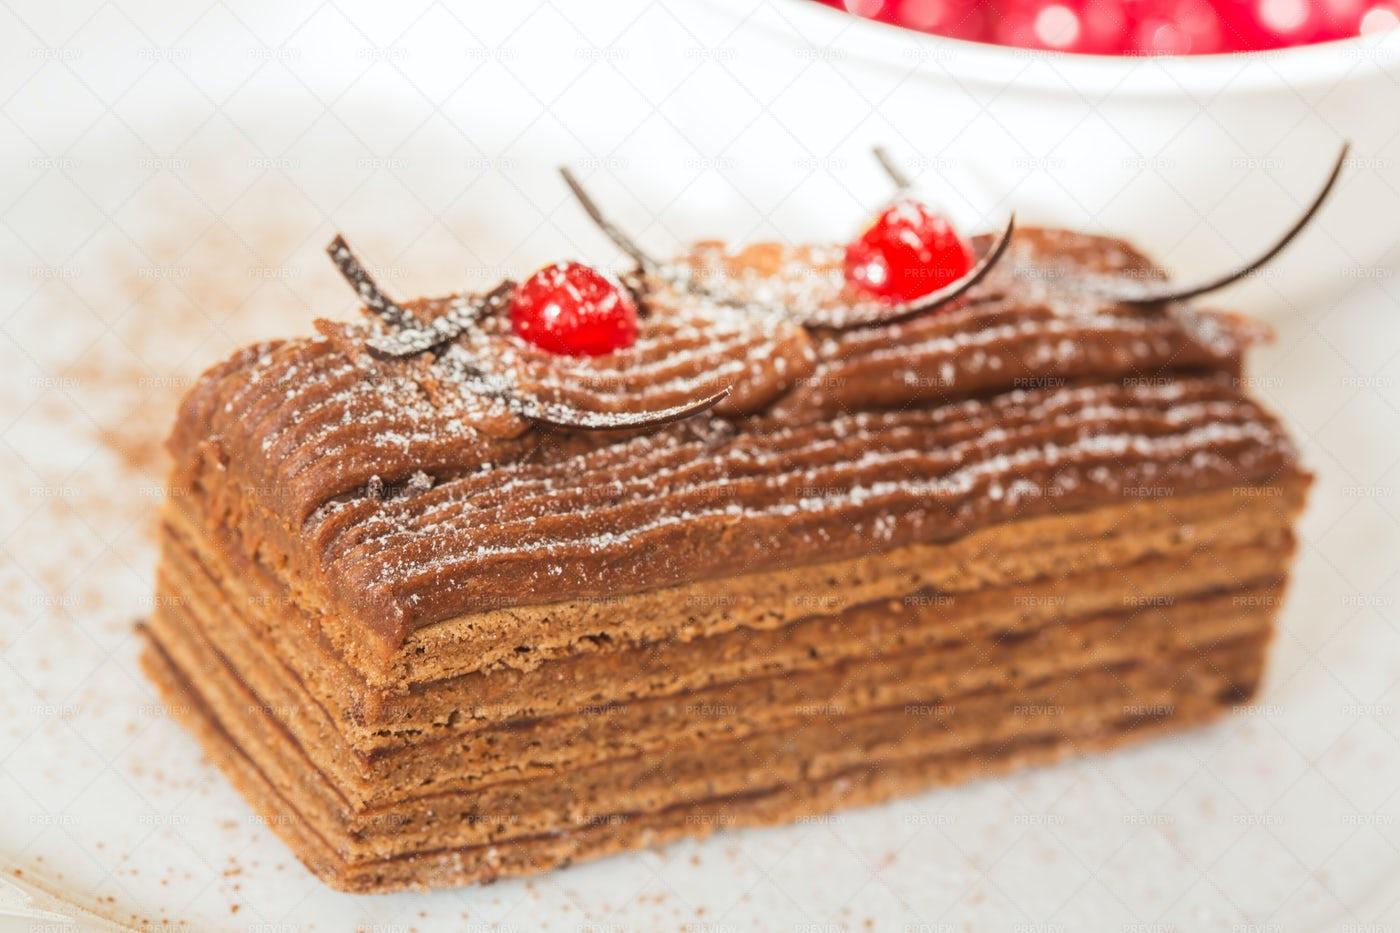 Honey Cake And Cranberries: Stock Photos